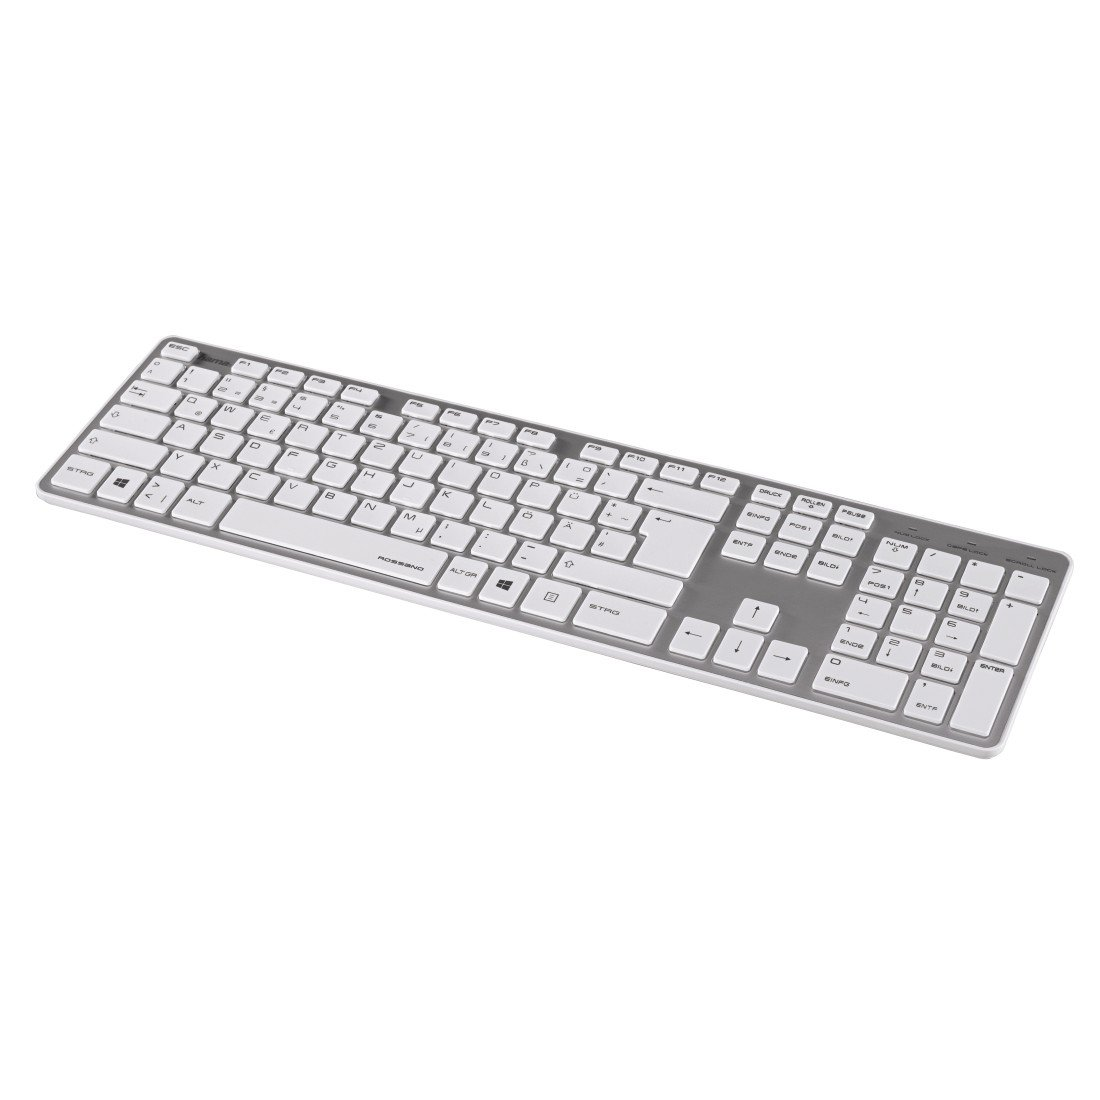 tastatur im test